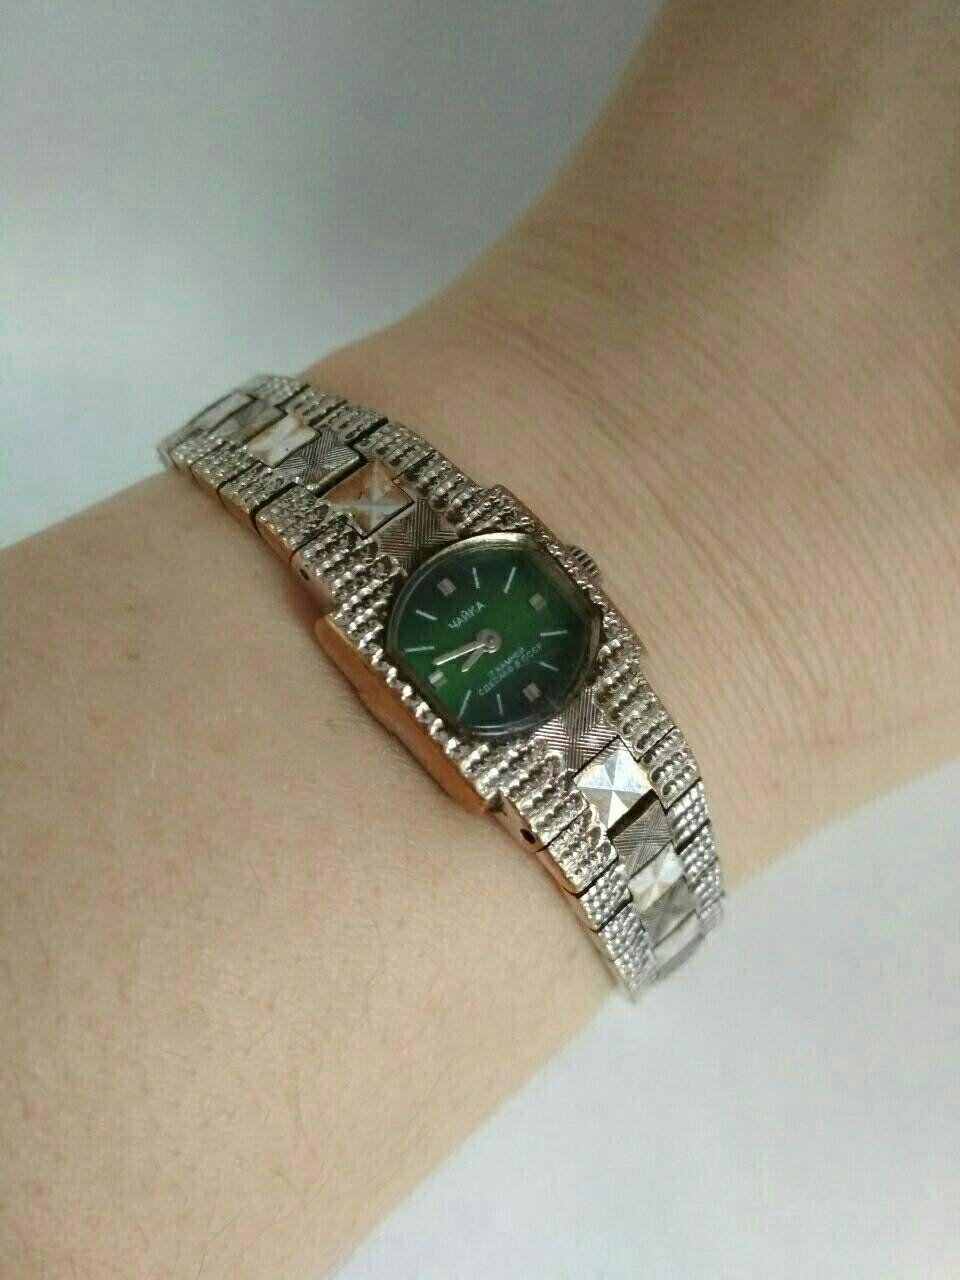 Green mechanical watch Chaika 17 jewels Gold vintage Ladies watch Soviet watch Women's retro watch Vintage watch Russian watch #vintagewatches